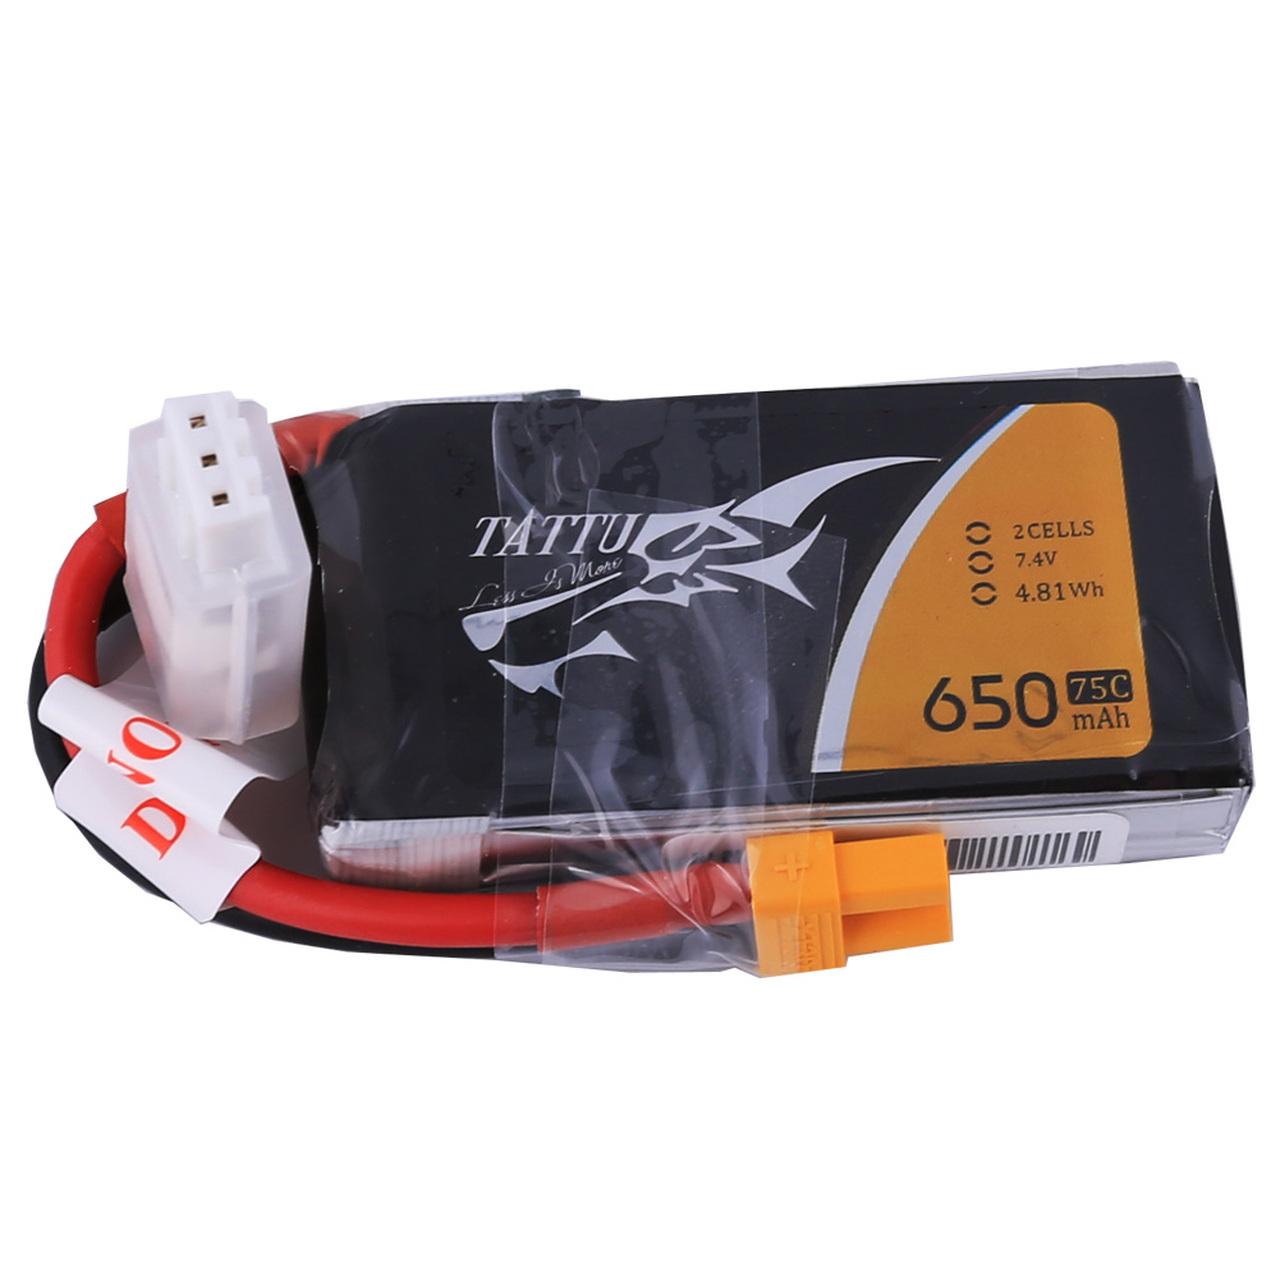 Tattu 650mAh 2S1P 75C 7.4V Lipo Battery Pack with XT30 Plug